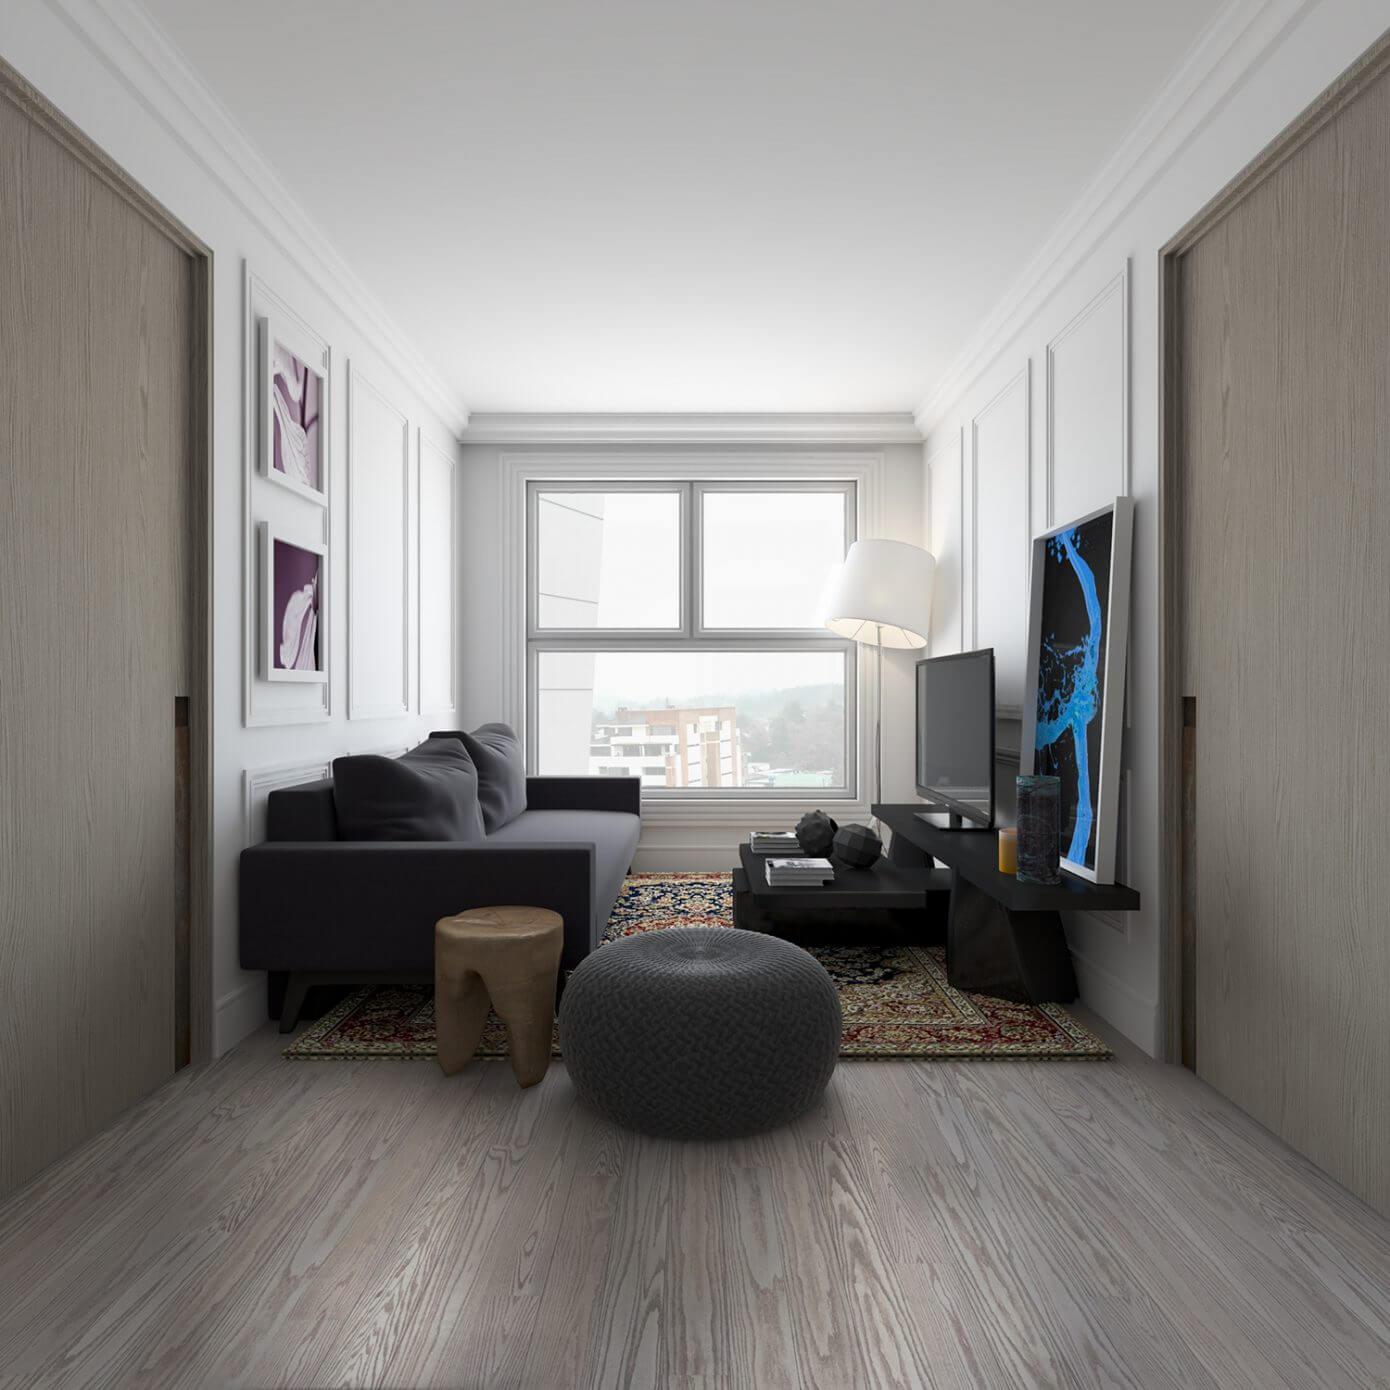 011 sky apartment estudio ed homeadore - Moderne deco volwassen kamer ...